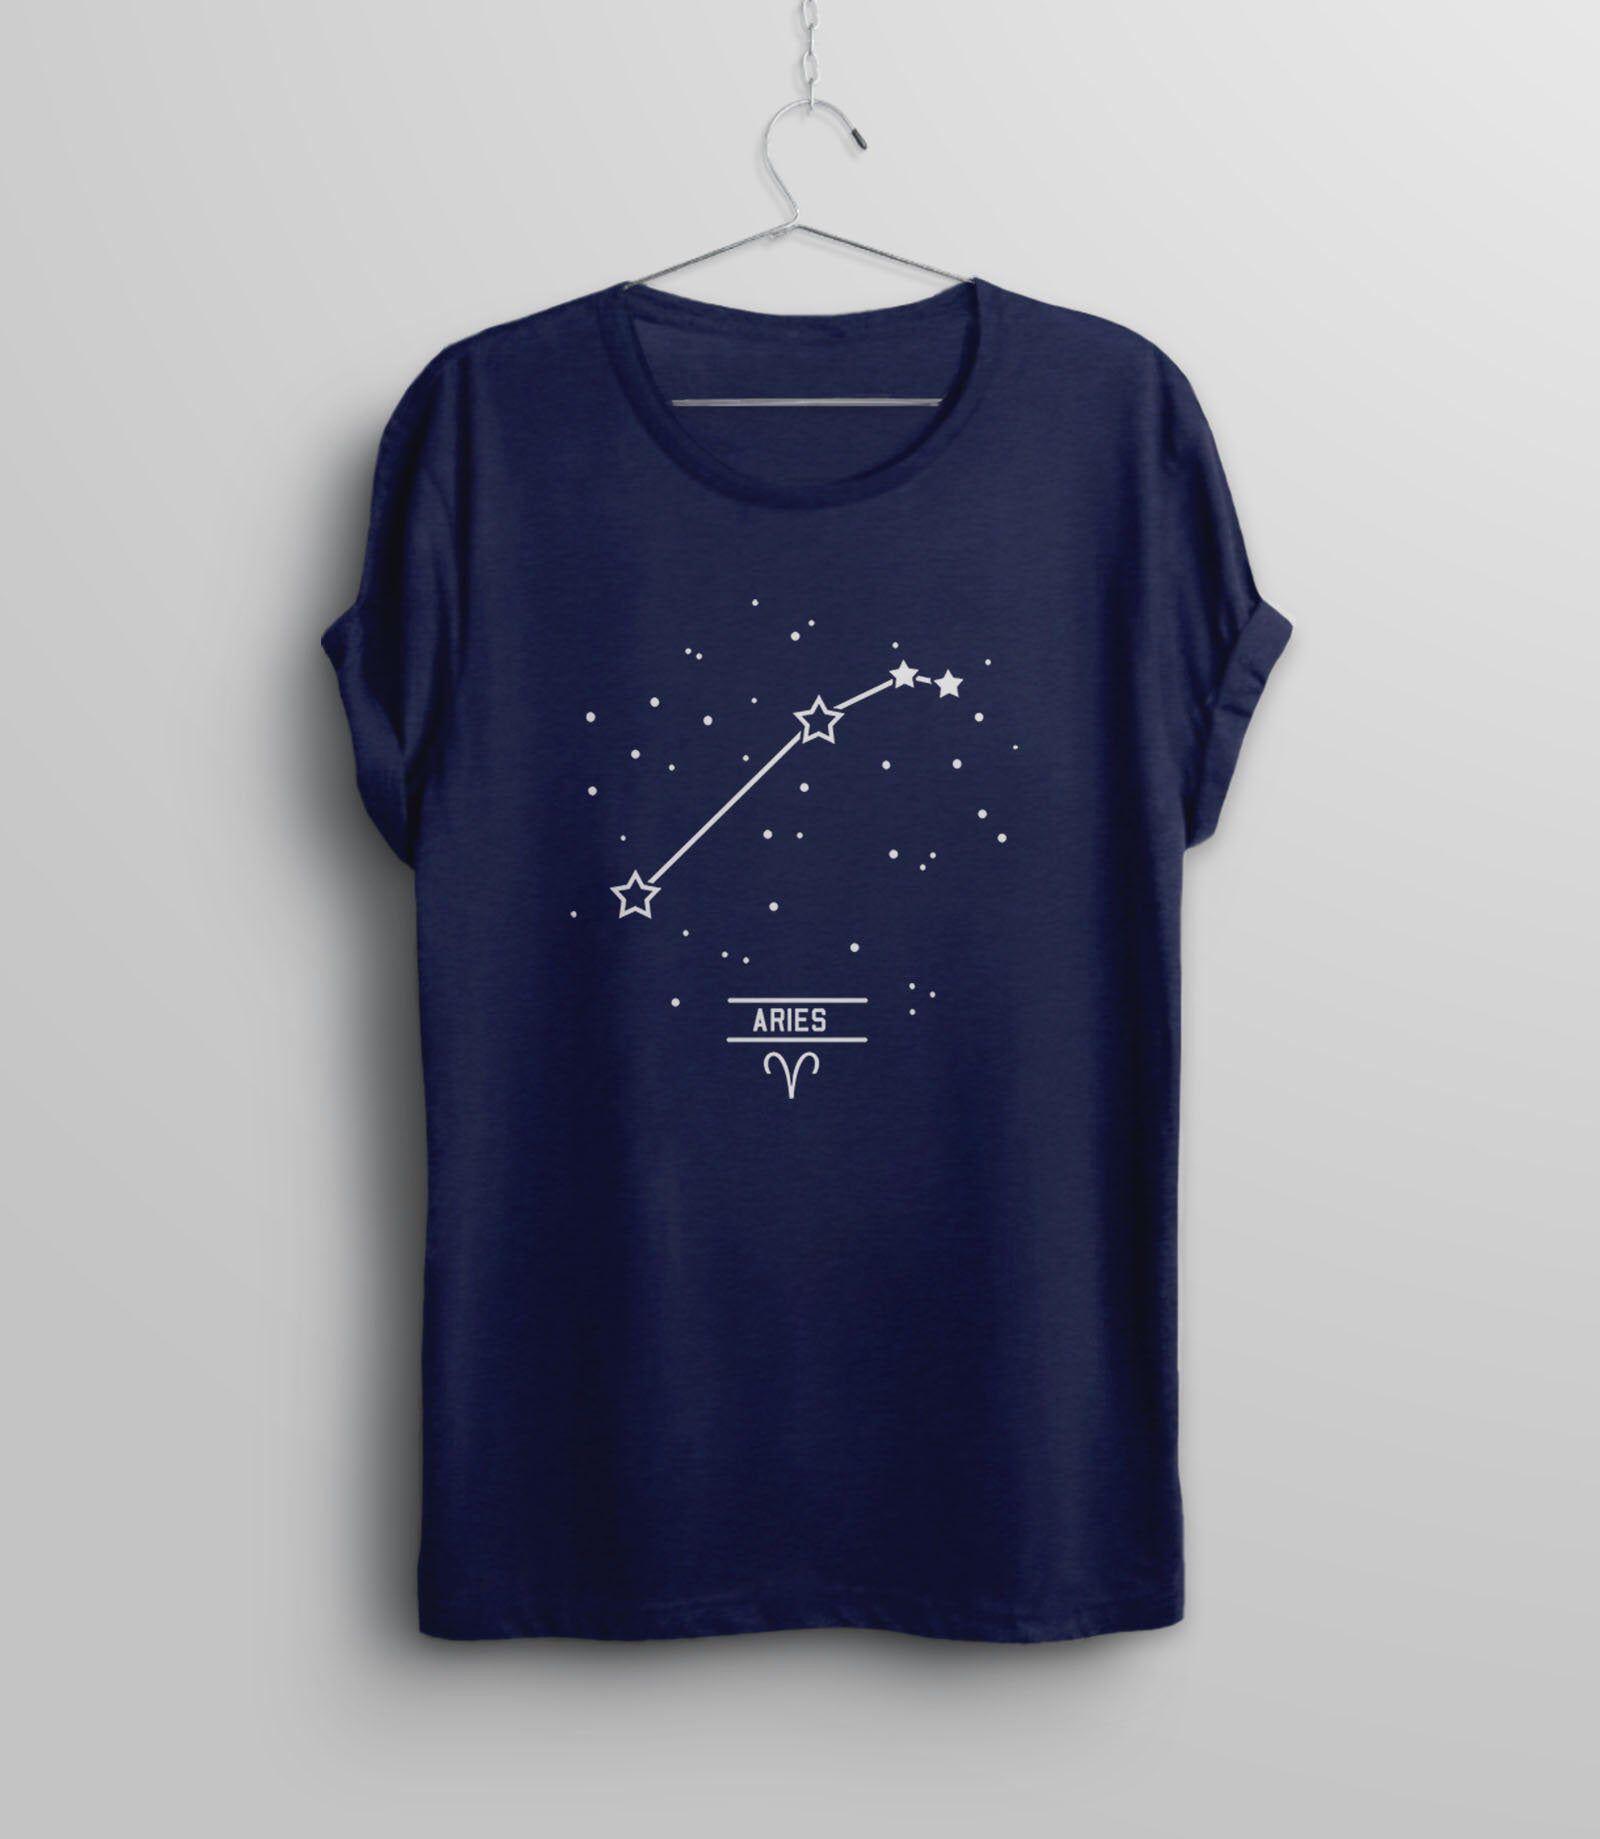 Aries Constellation T Shirt March Birthday Shirt, Women